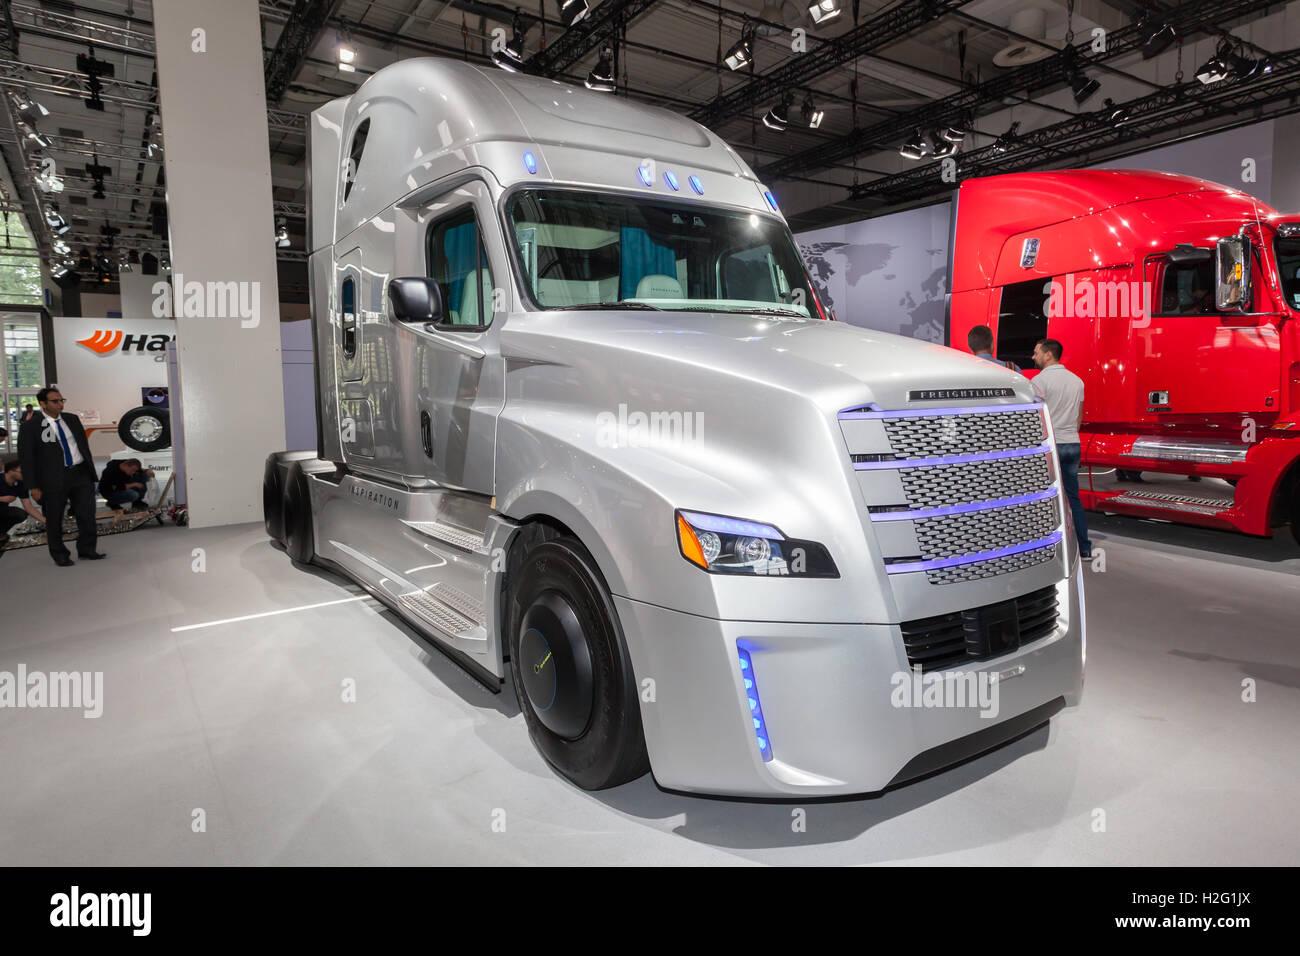 Freightliner Inspiration  Autonomous Truck At The Iaa